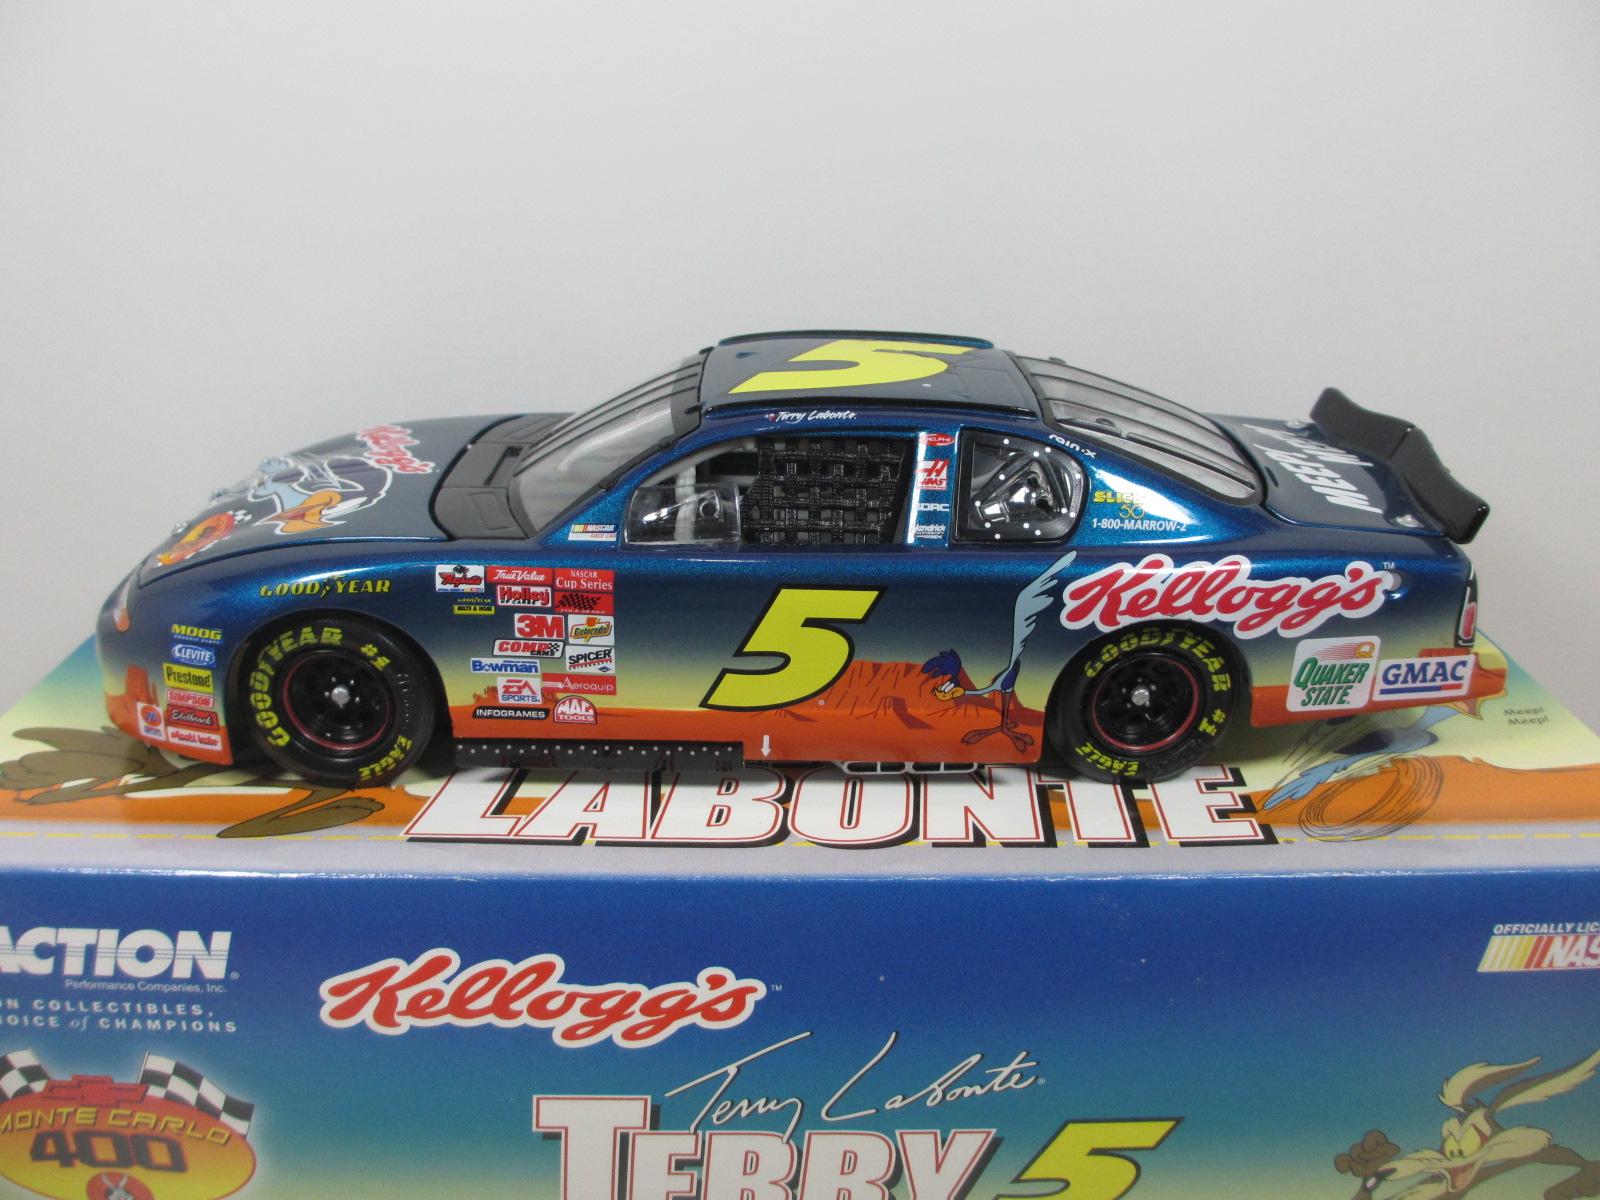 1/24 Action Terry Labonte #5 2001 ロードランナー 24-119